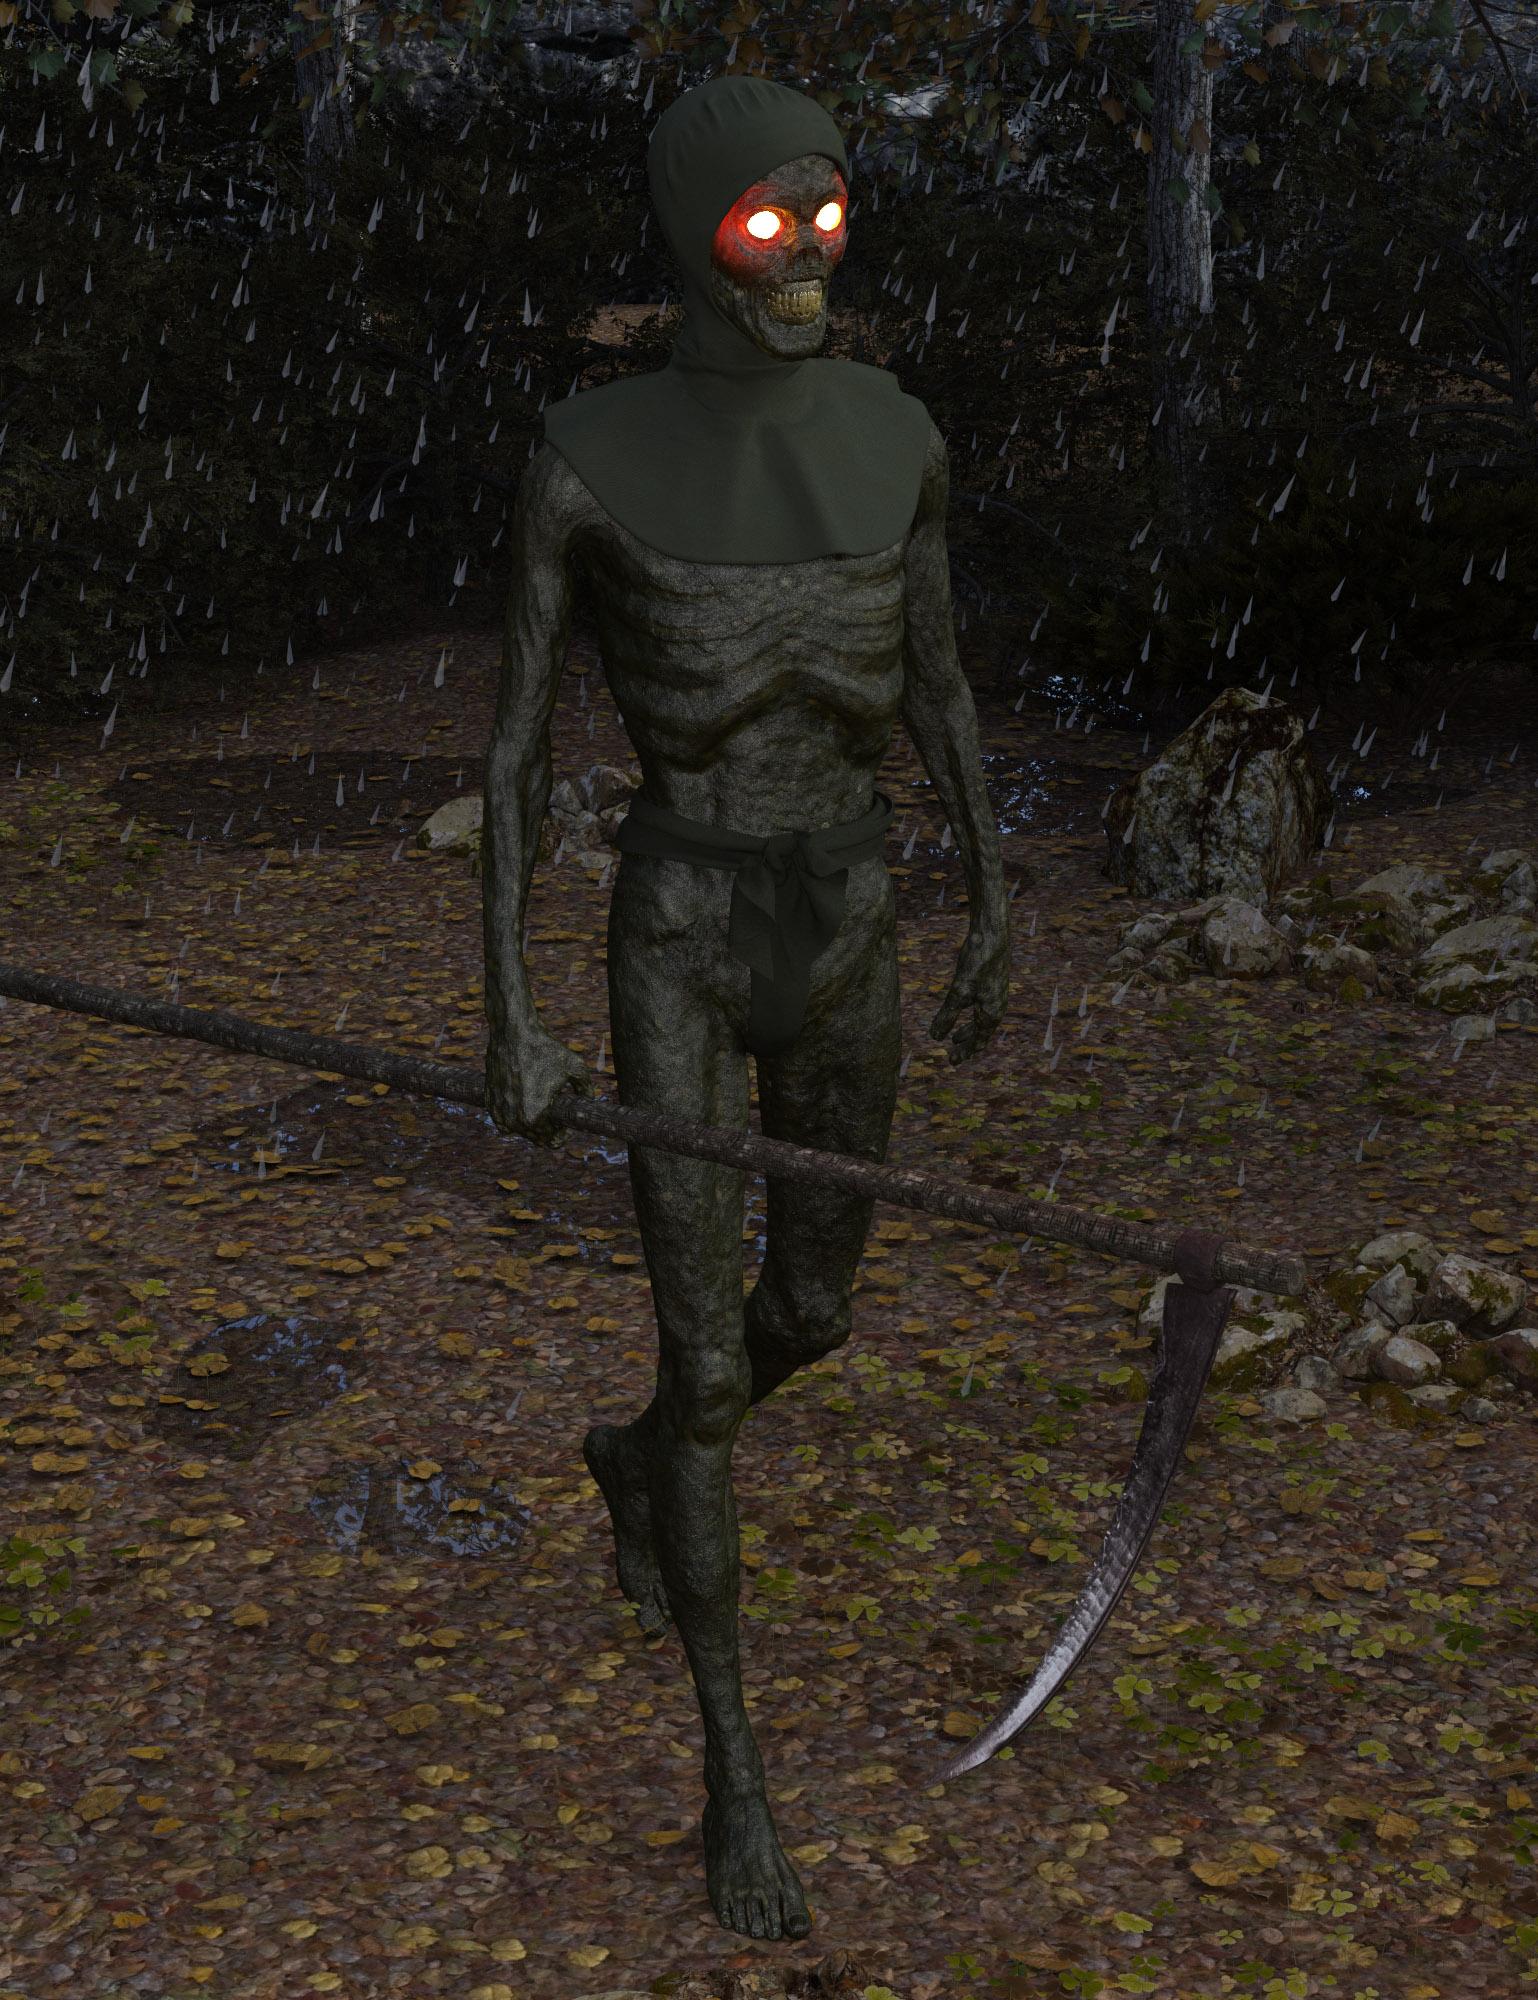 Medieval Death HD for Genesis 8 Male by: Oskarsson, 3D Models by Daz 3D